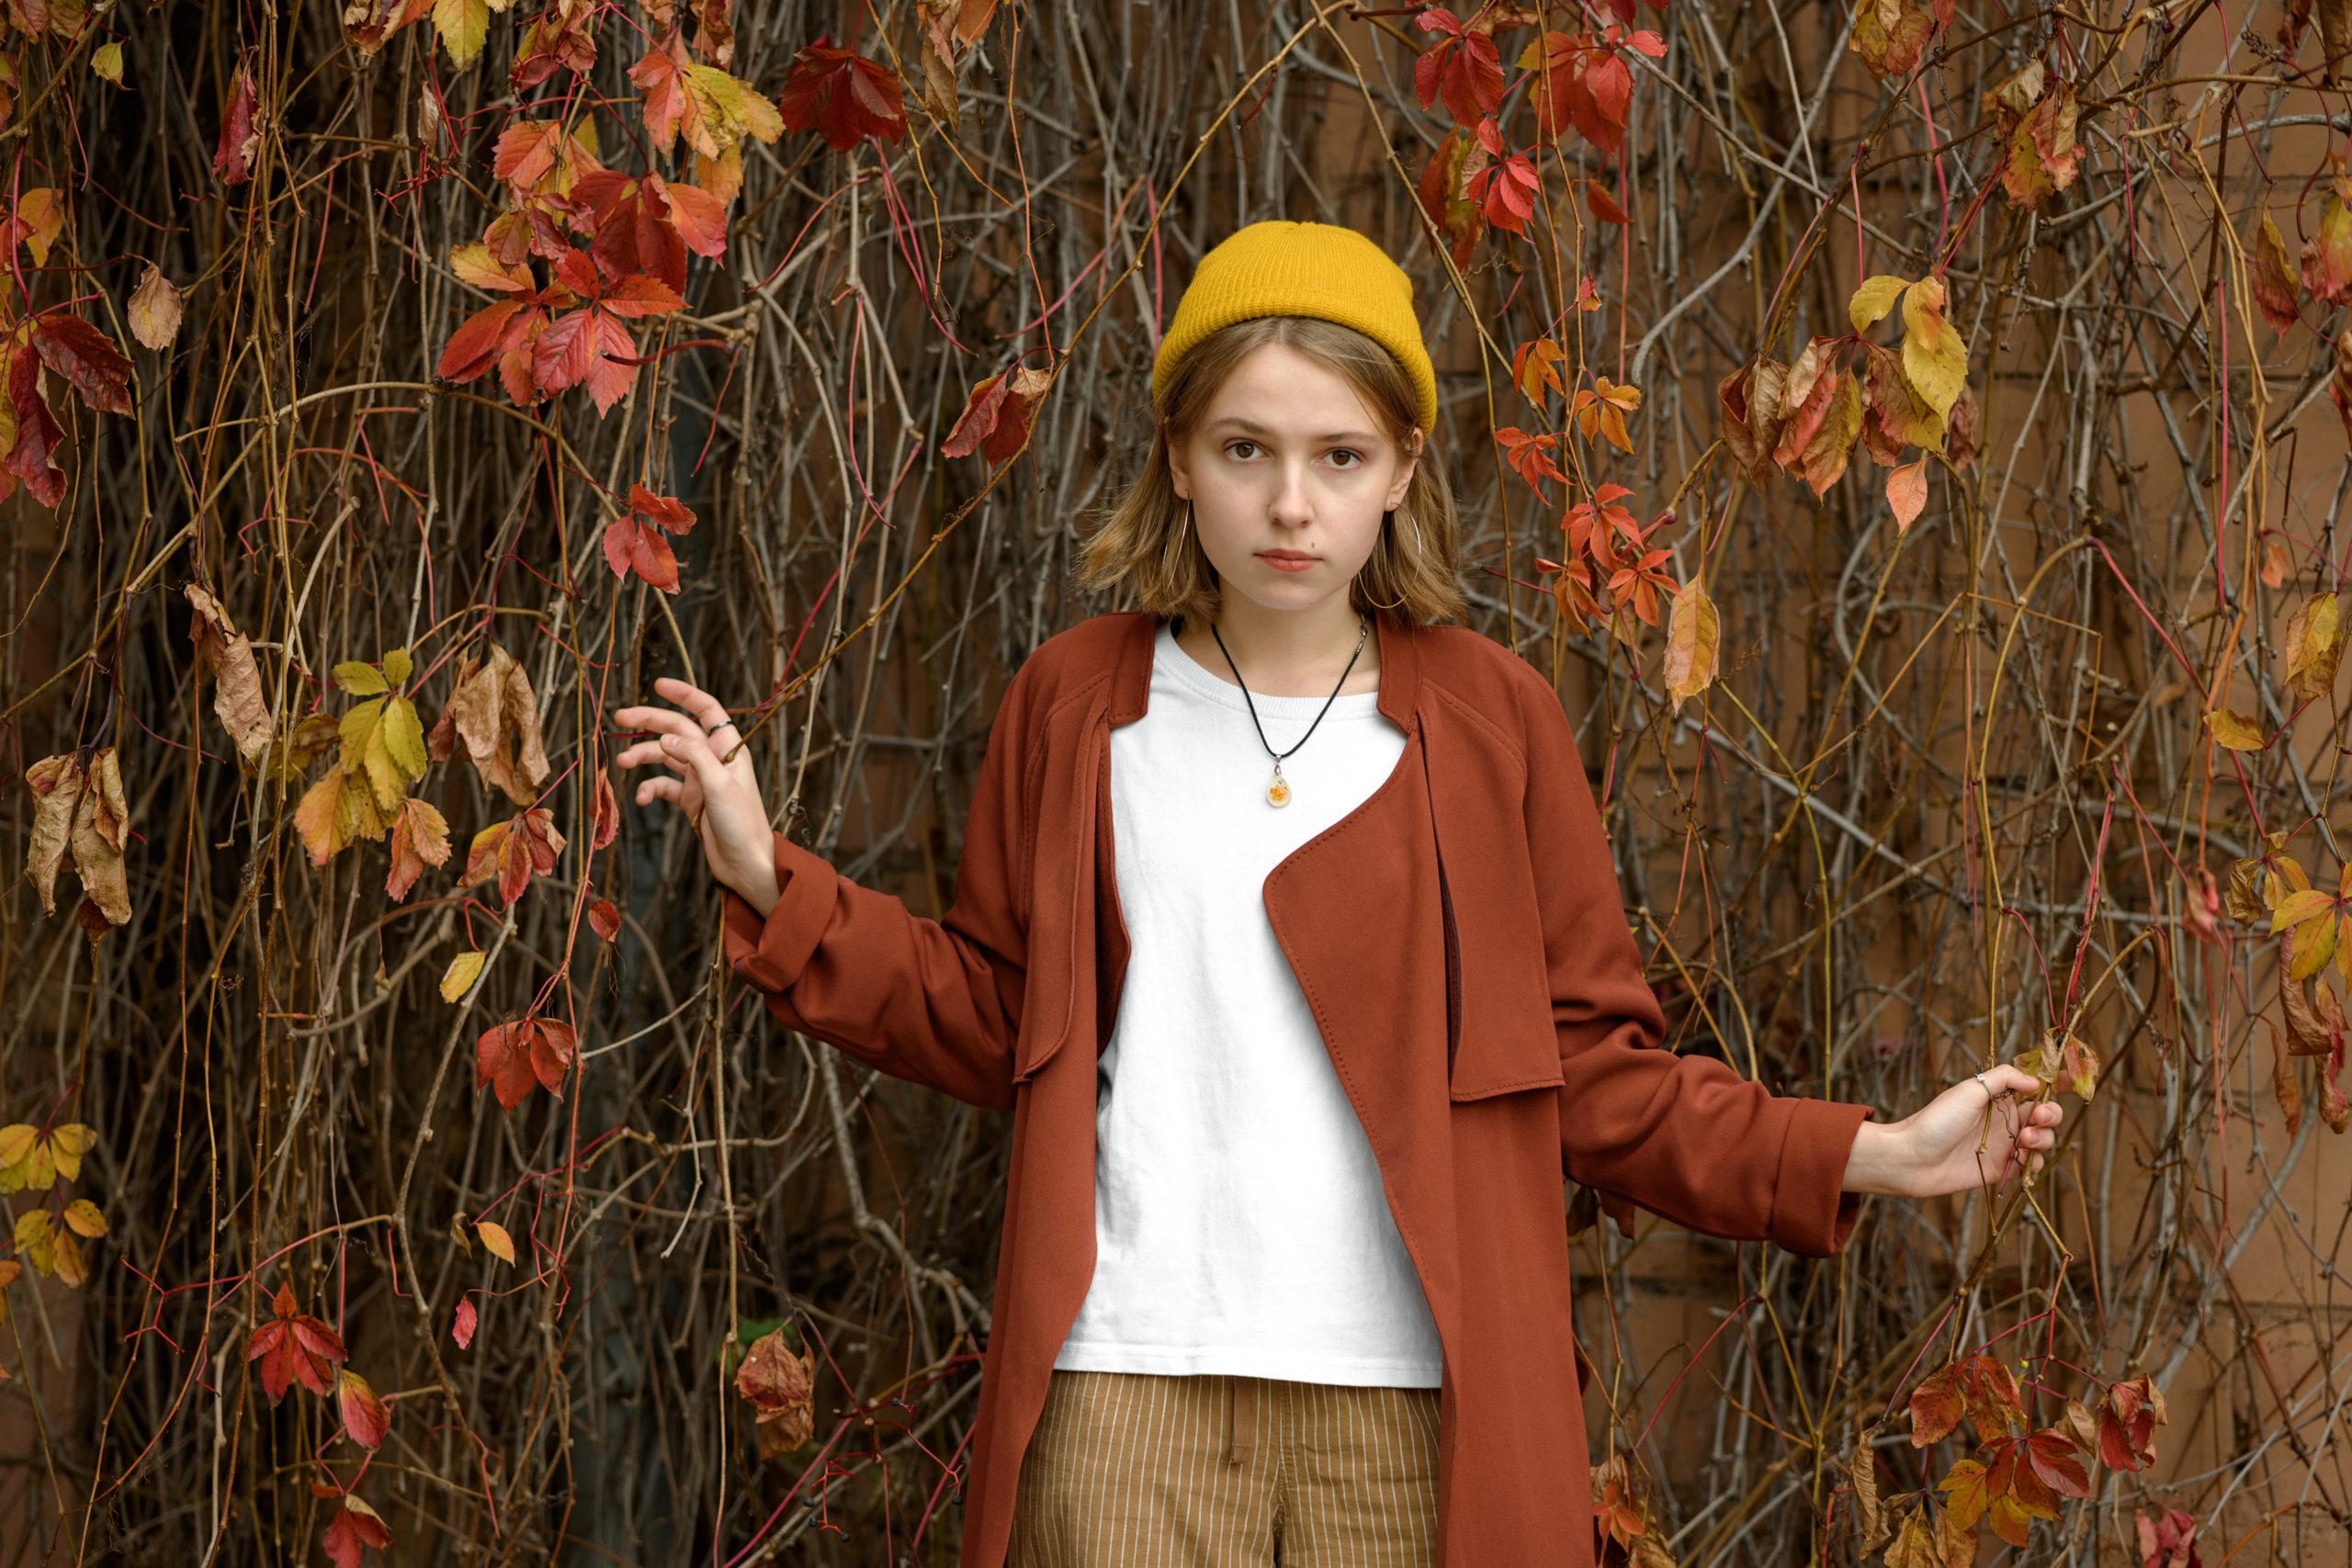 Осенняя уличная фотосессия